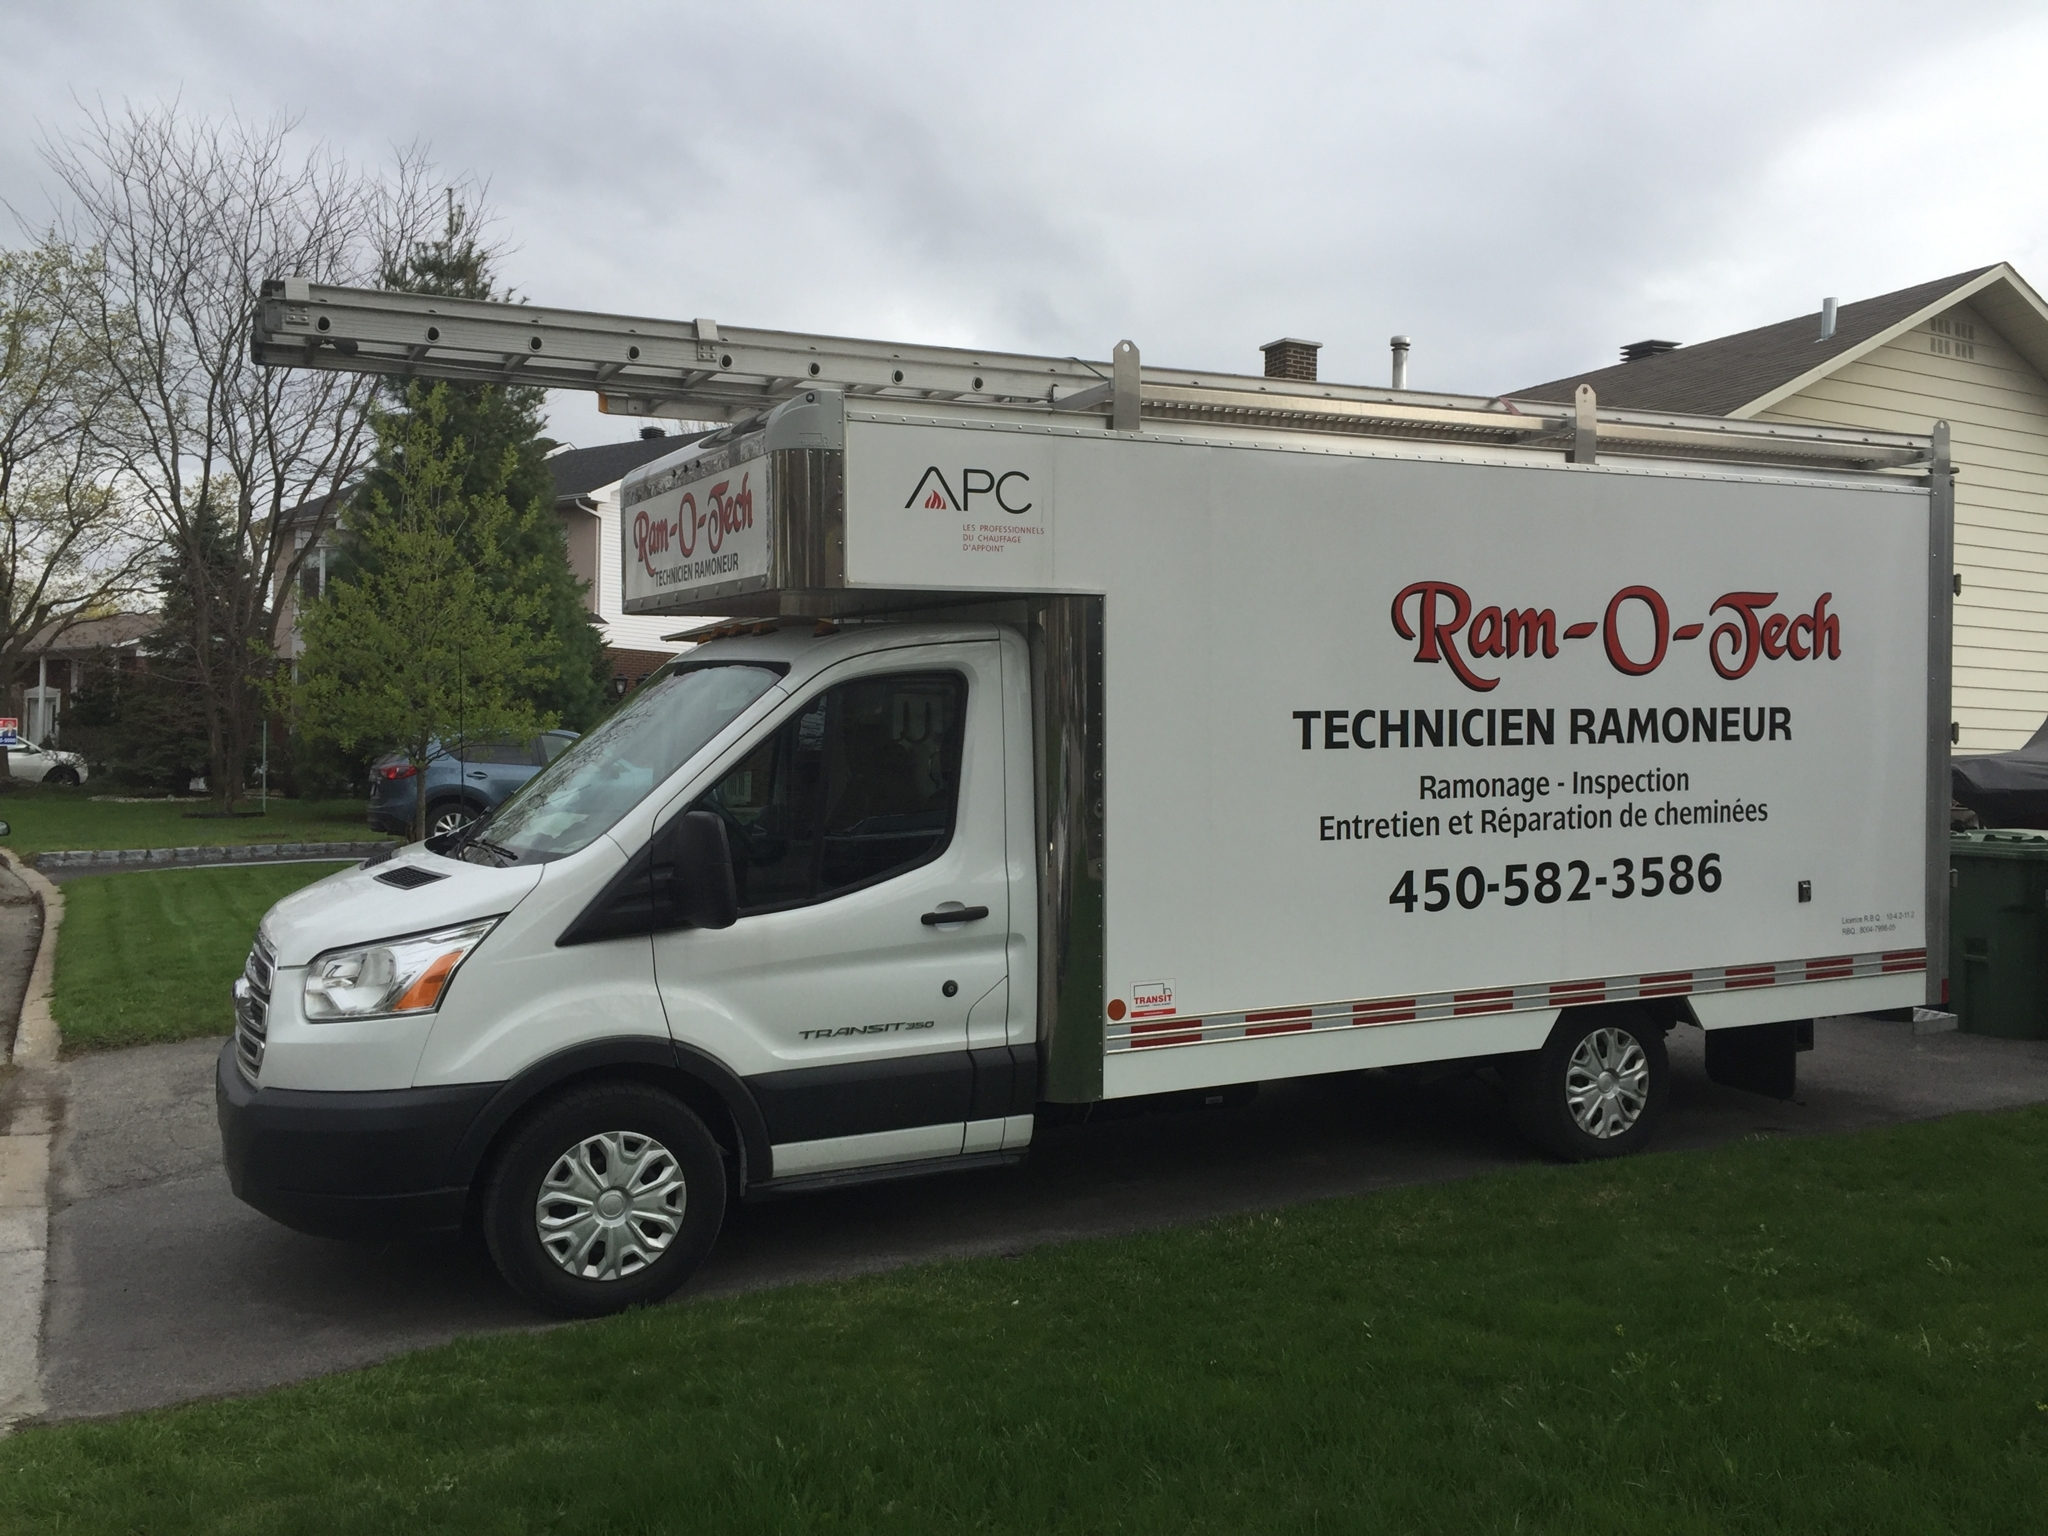 Ram-O-Tech Ramoneur à L'Assomption: Ram-O-Tech Chimney Sweeper